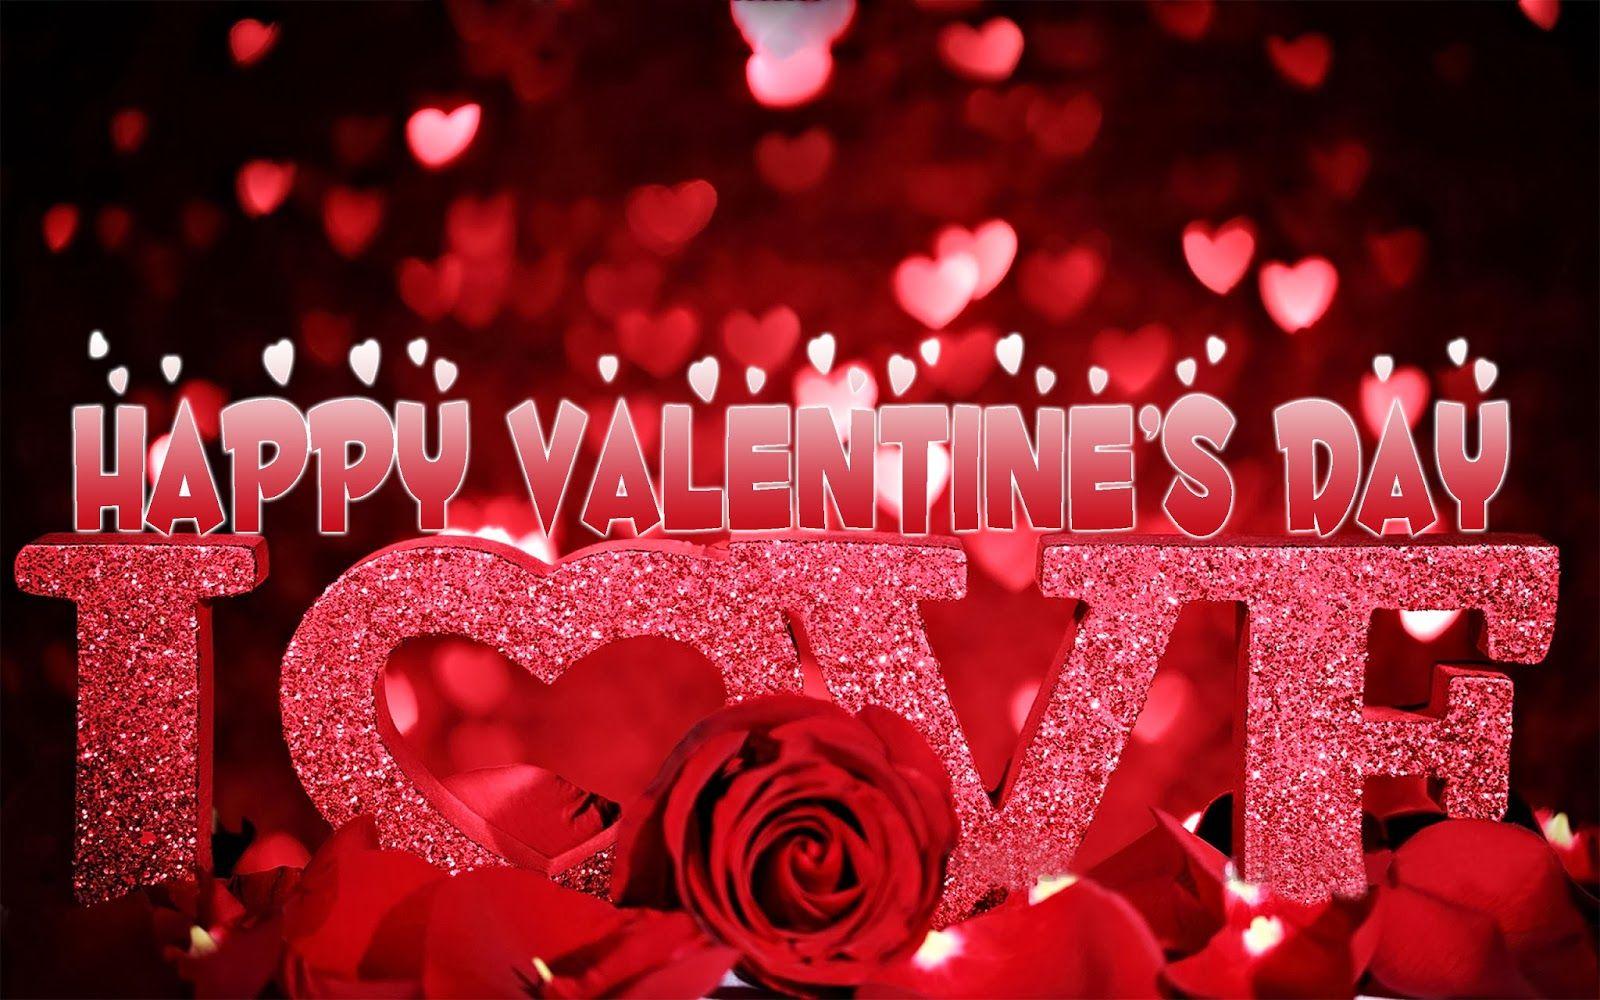 Beautiful Wallpaper Love Valentine Day - 4aa56c0e0a49cfc7b706ab22aca4117d  Photograph_902498.jpg